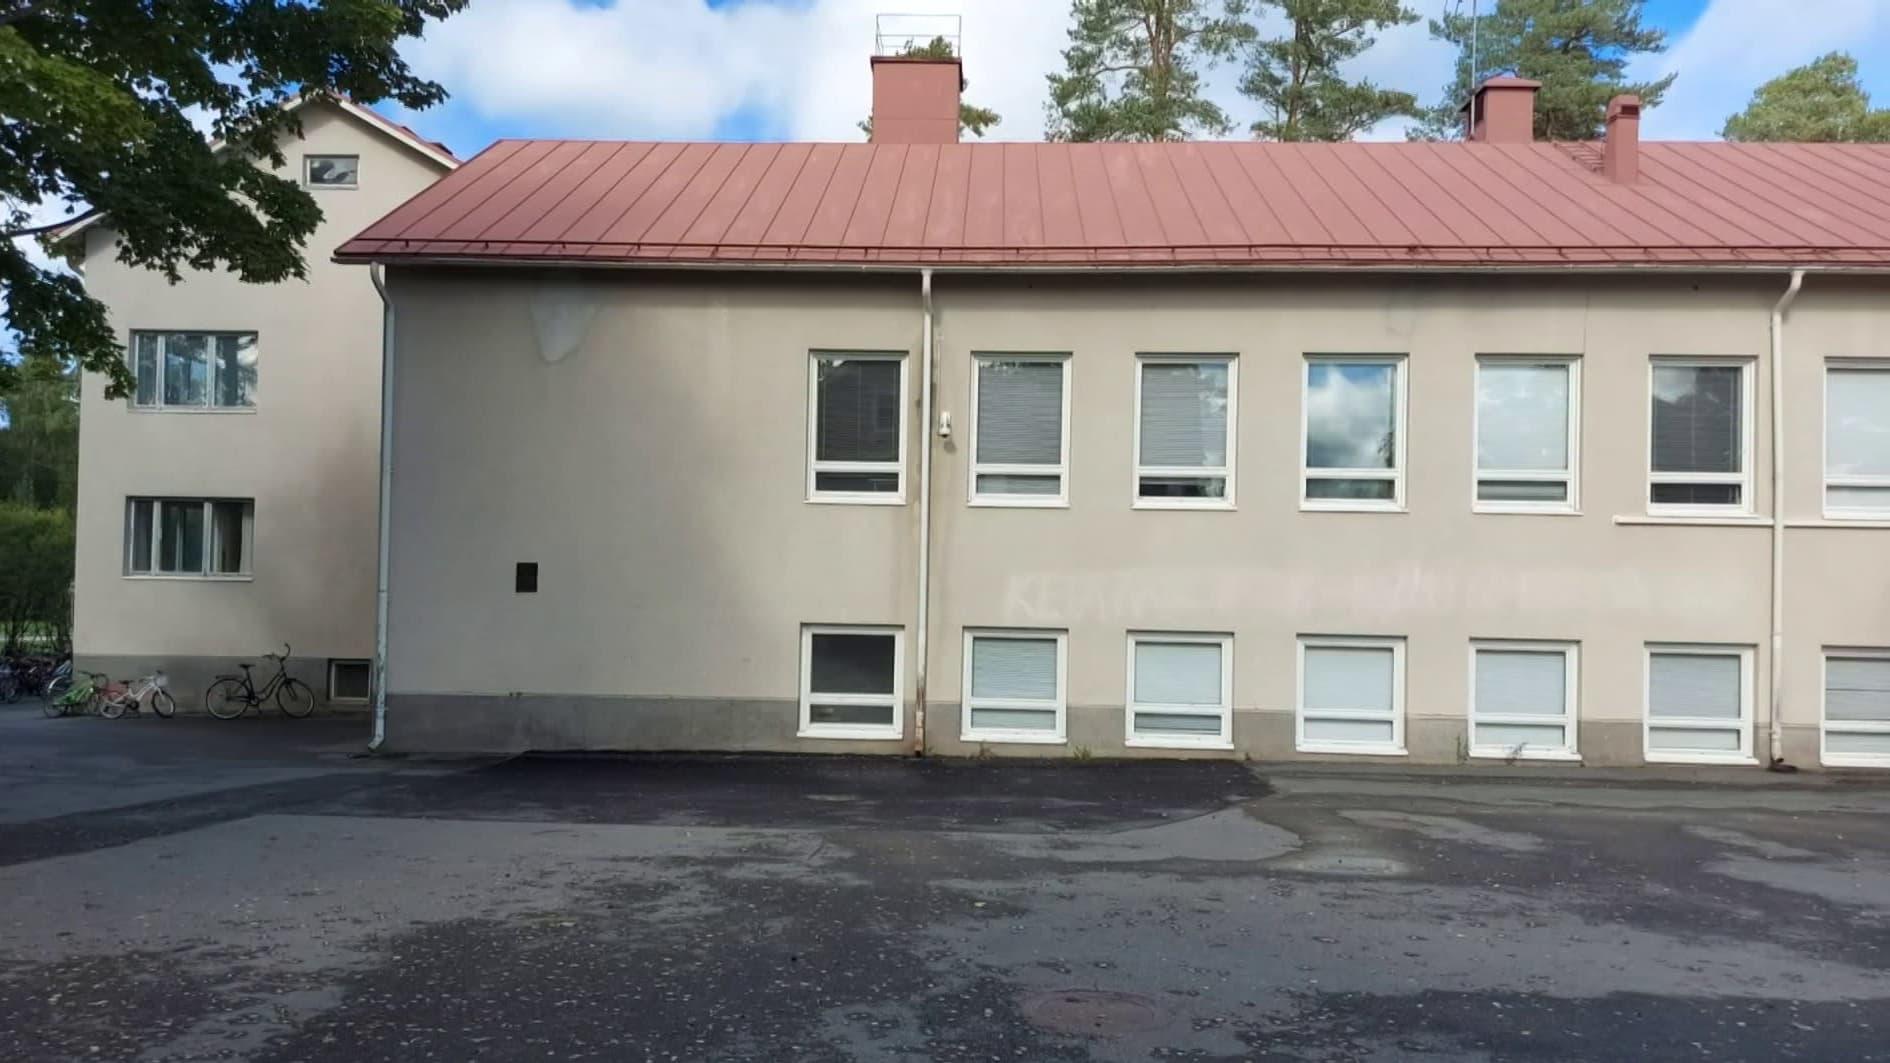 Ruununmyllyn koulu Hämeenlinnassa